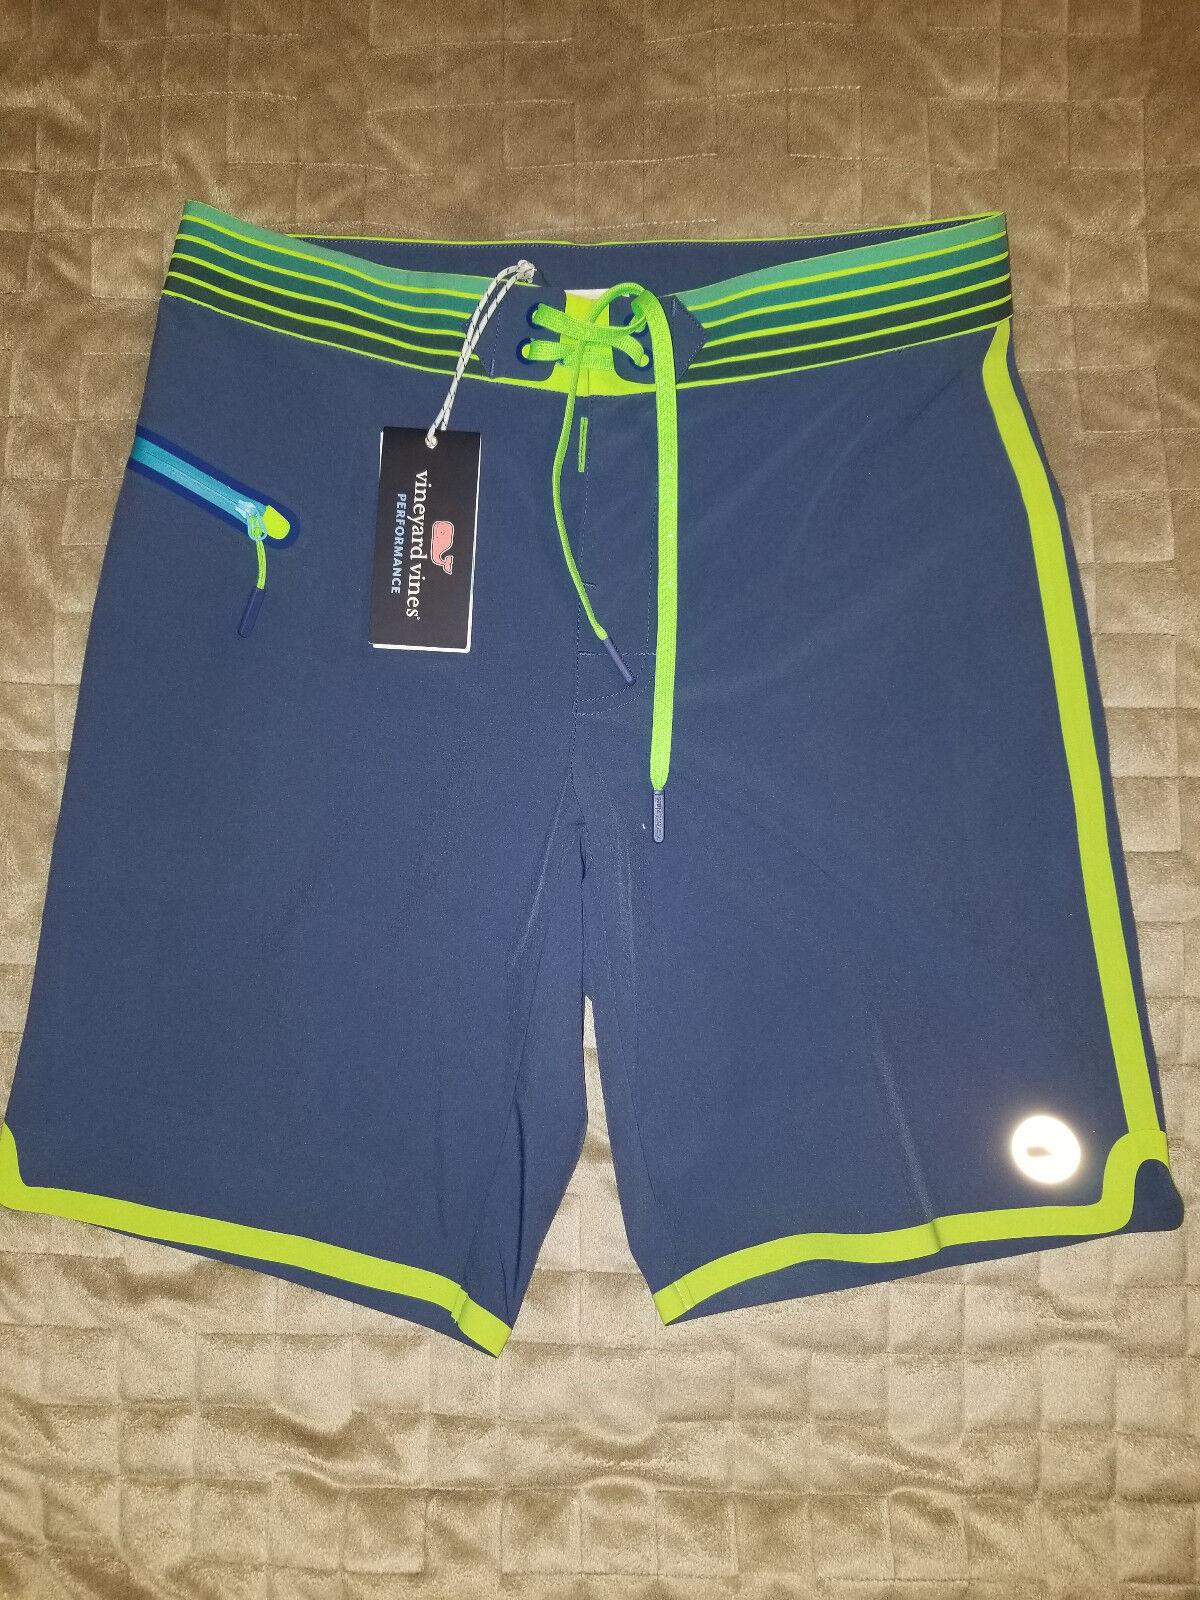 New VINEYARD VINES men swimwear shorts performance bluee neon 28 MSRP